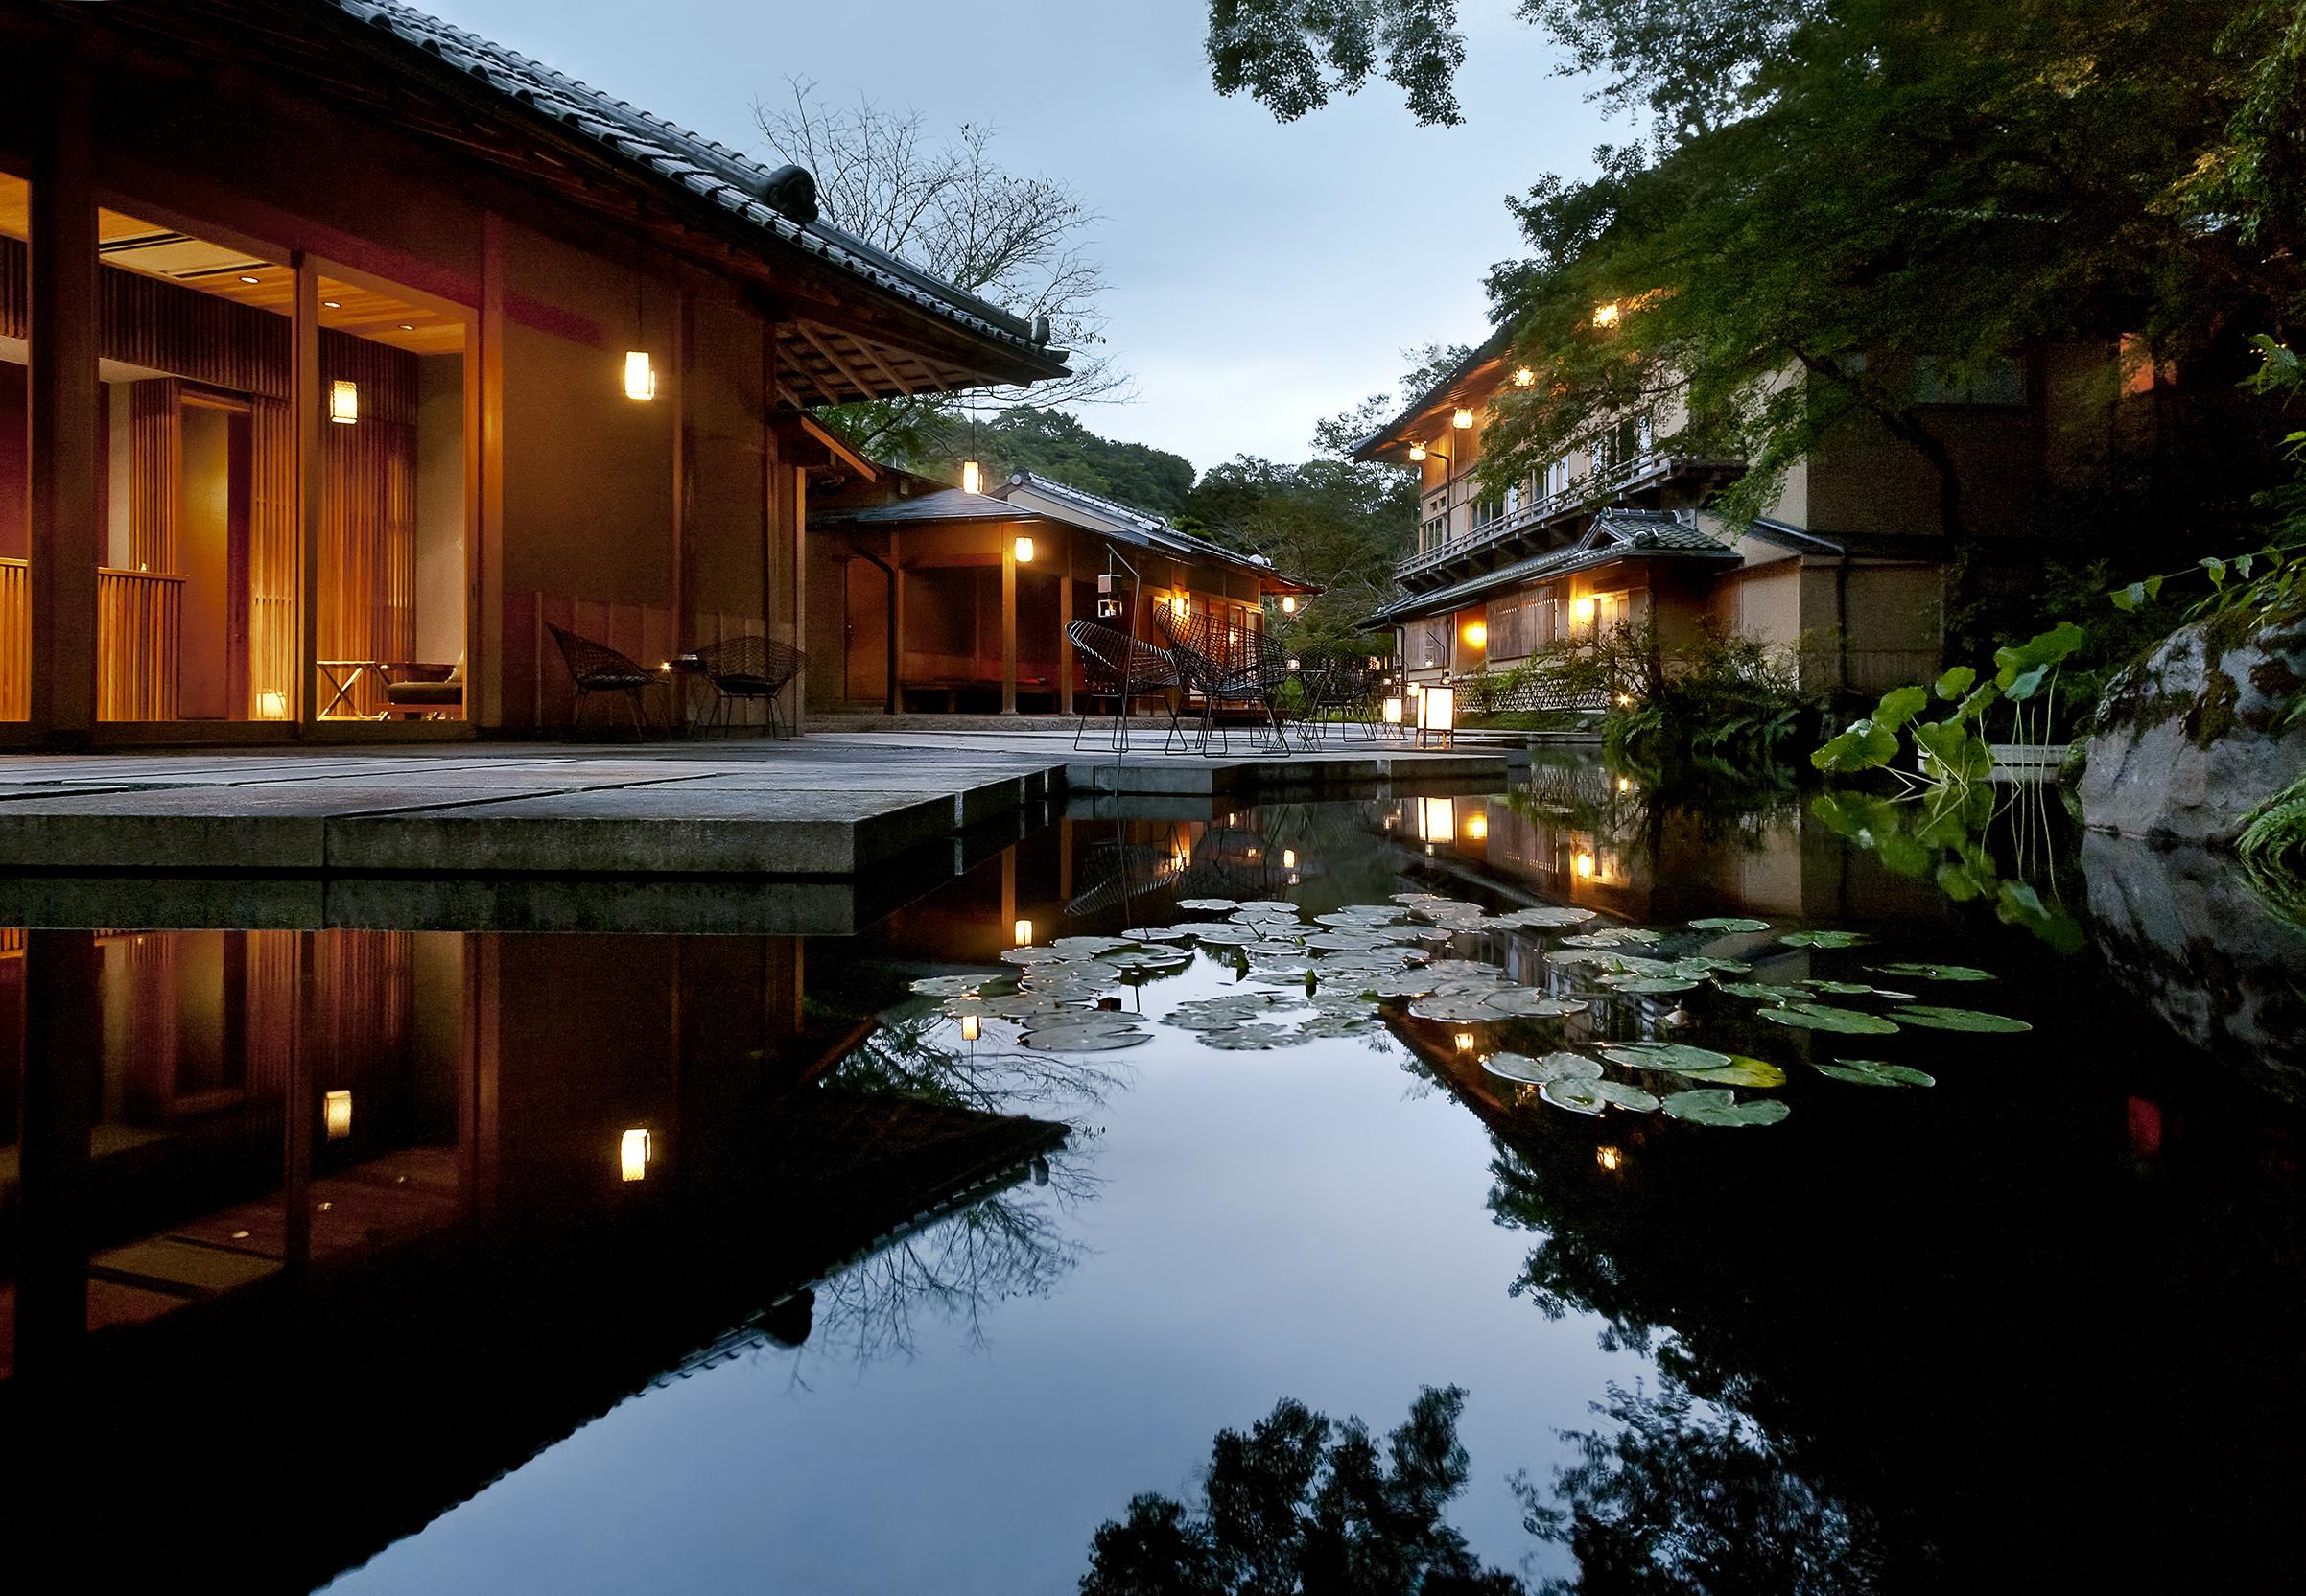 Hoshinoya_Kyoto.jpg